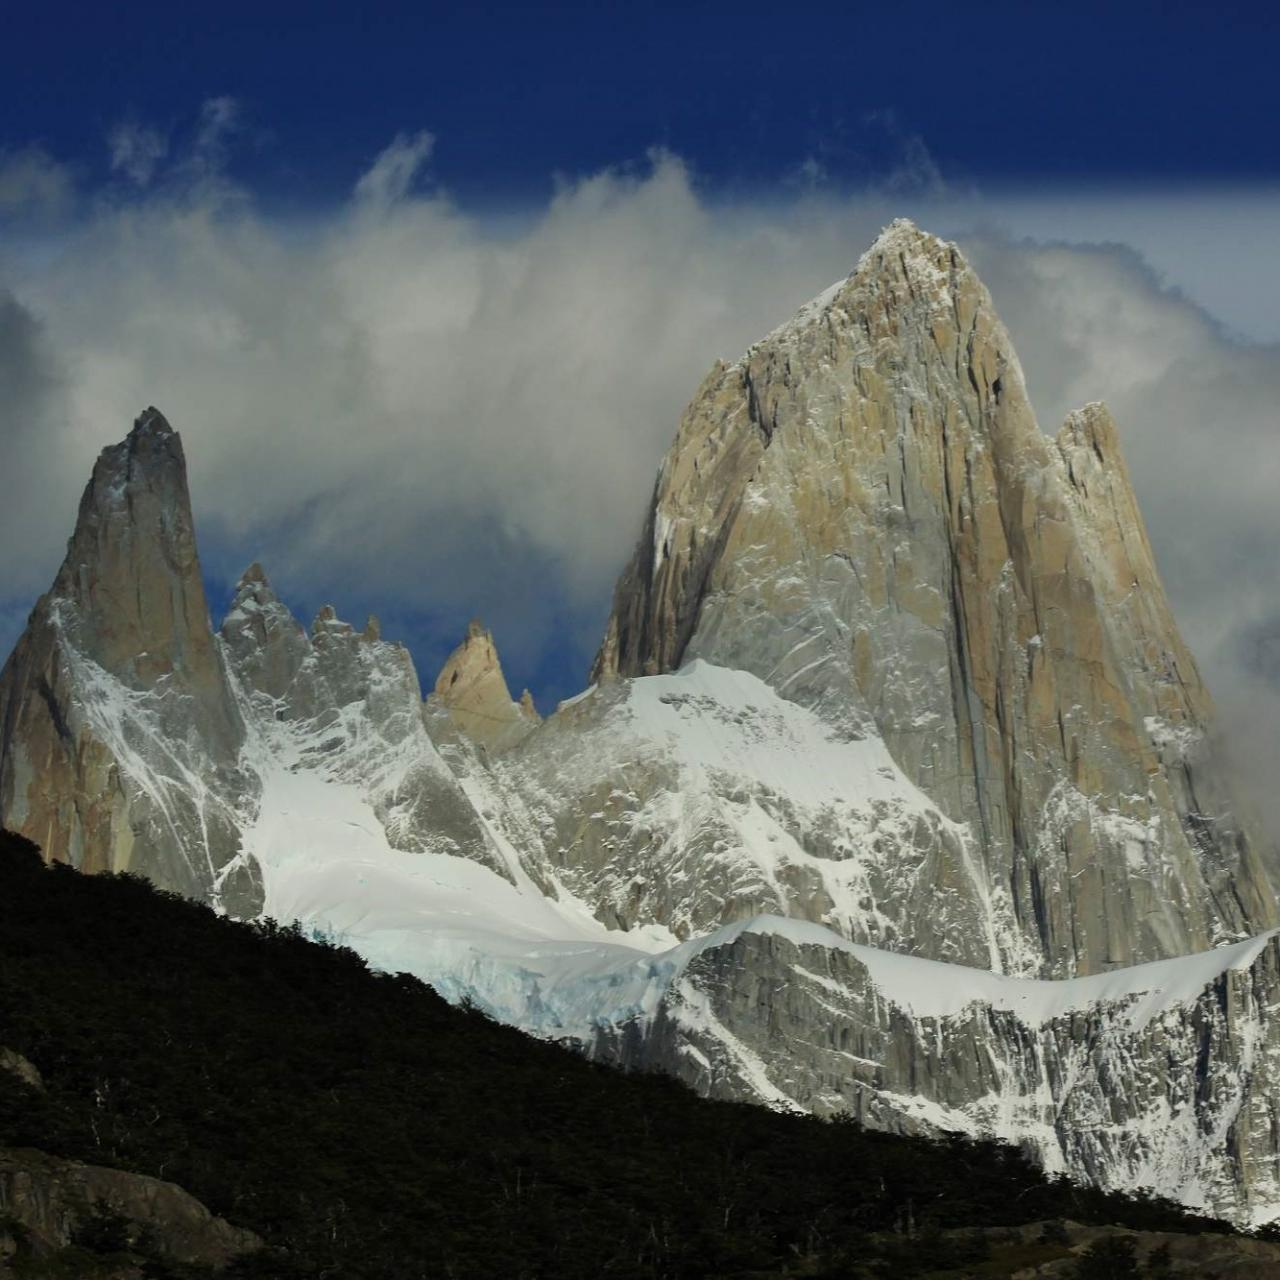 Poznávací zájezd Patagonie - Velký okruh :: Chile a Argentina